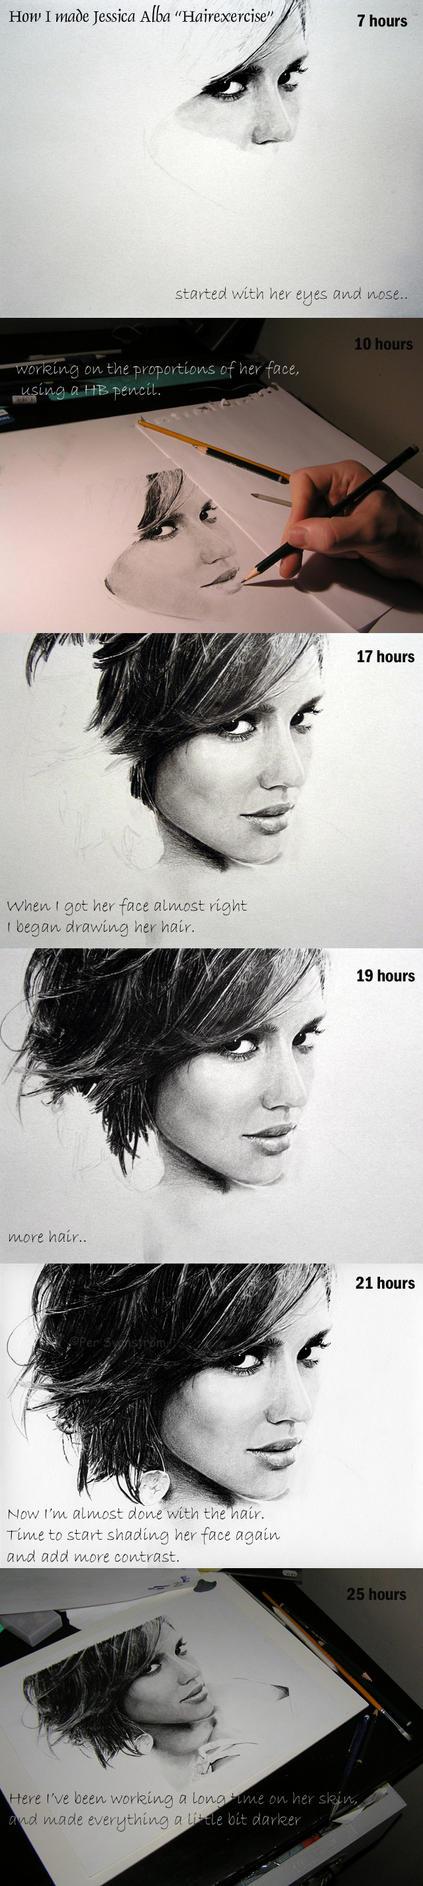 WIP J. Alba 'Hair exercise' by Per-Svanstrom